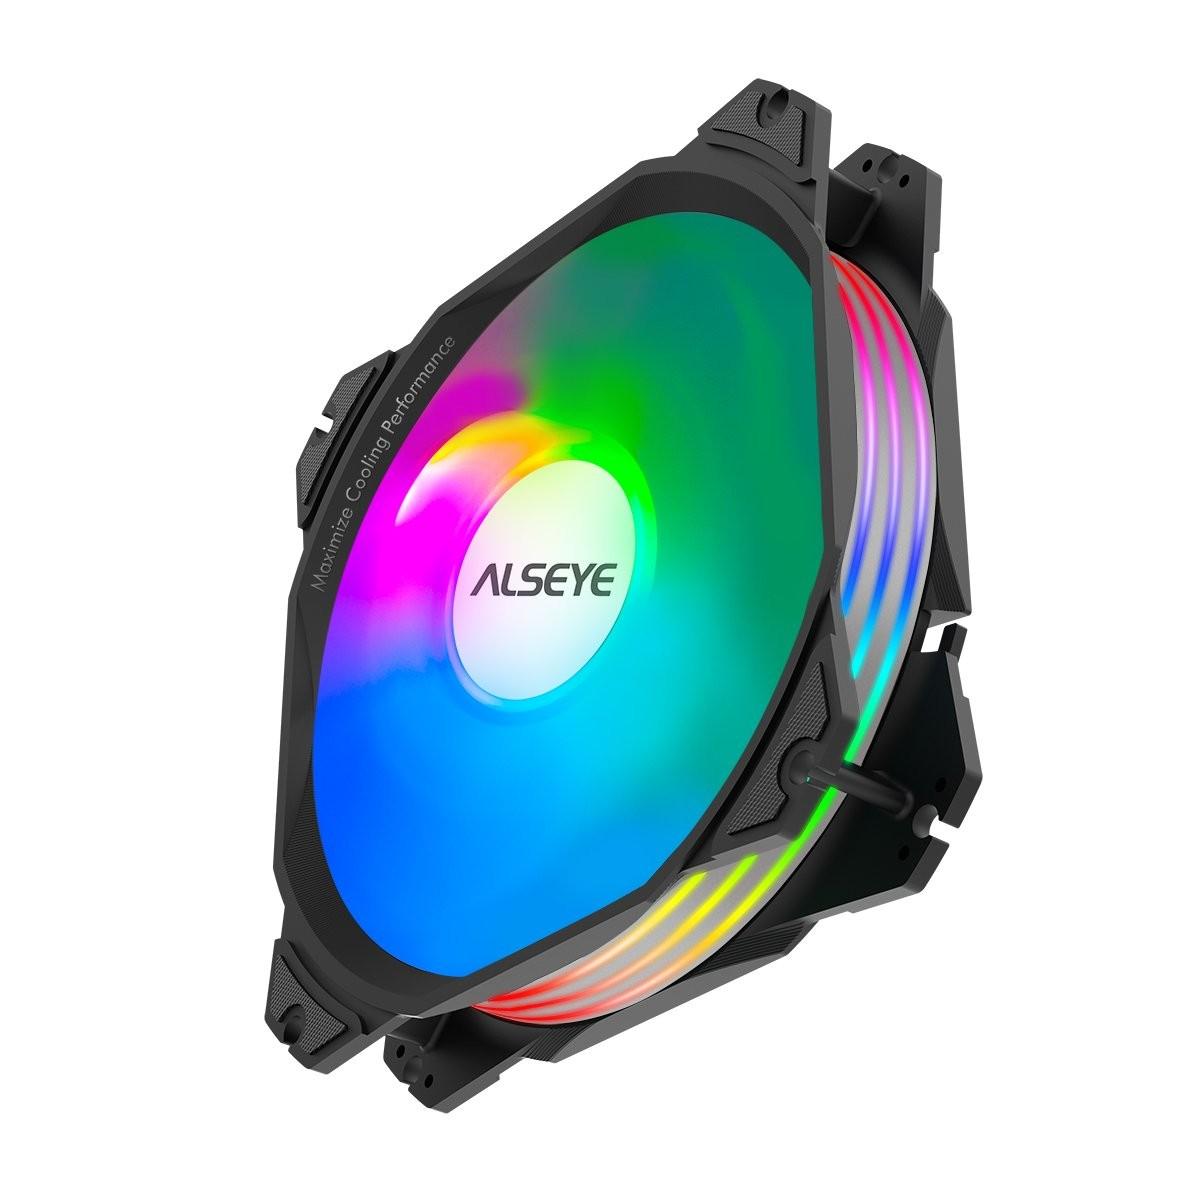 Kit Fan com 3 Unidades Alseye M120-P Black, RGB, 120mm, Com Controlador, M120-P Black